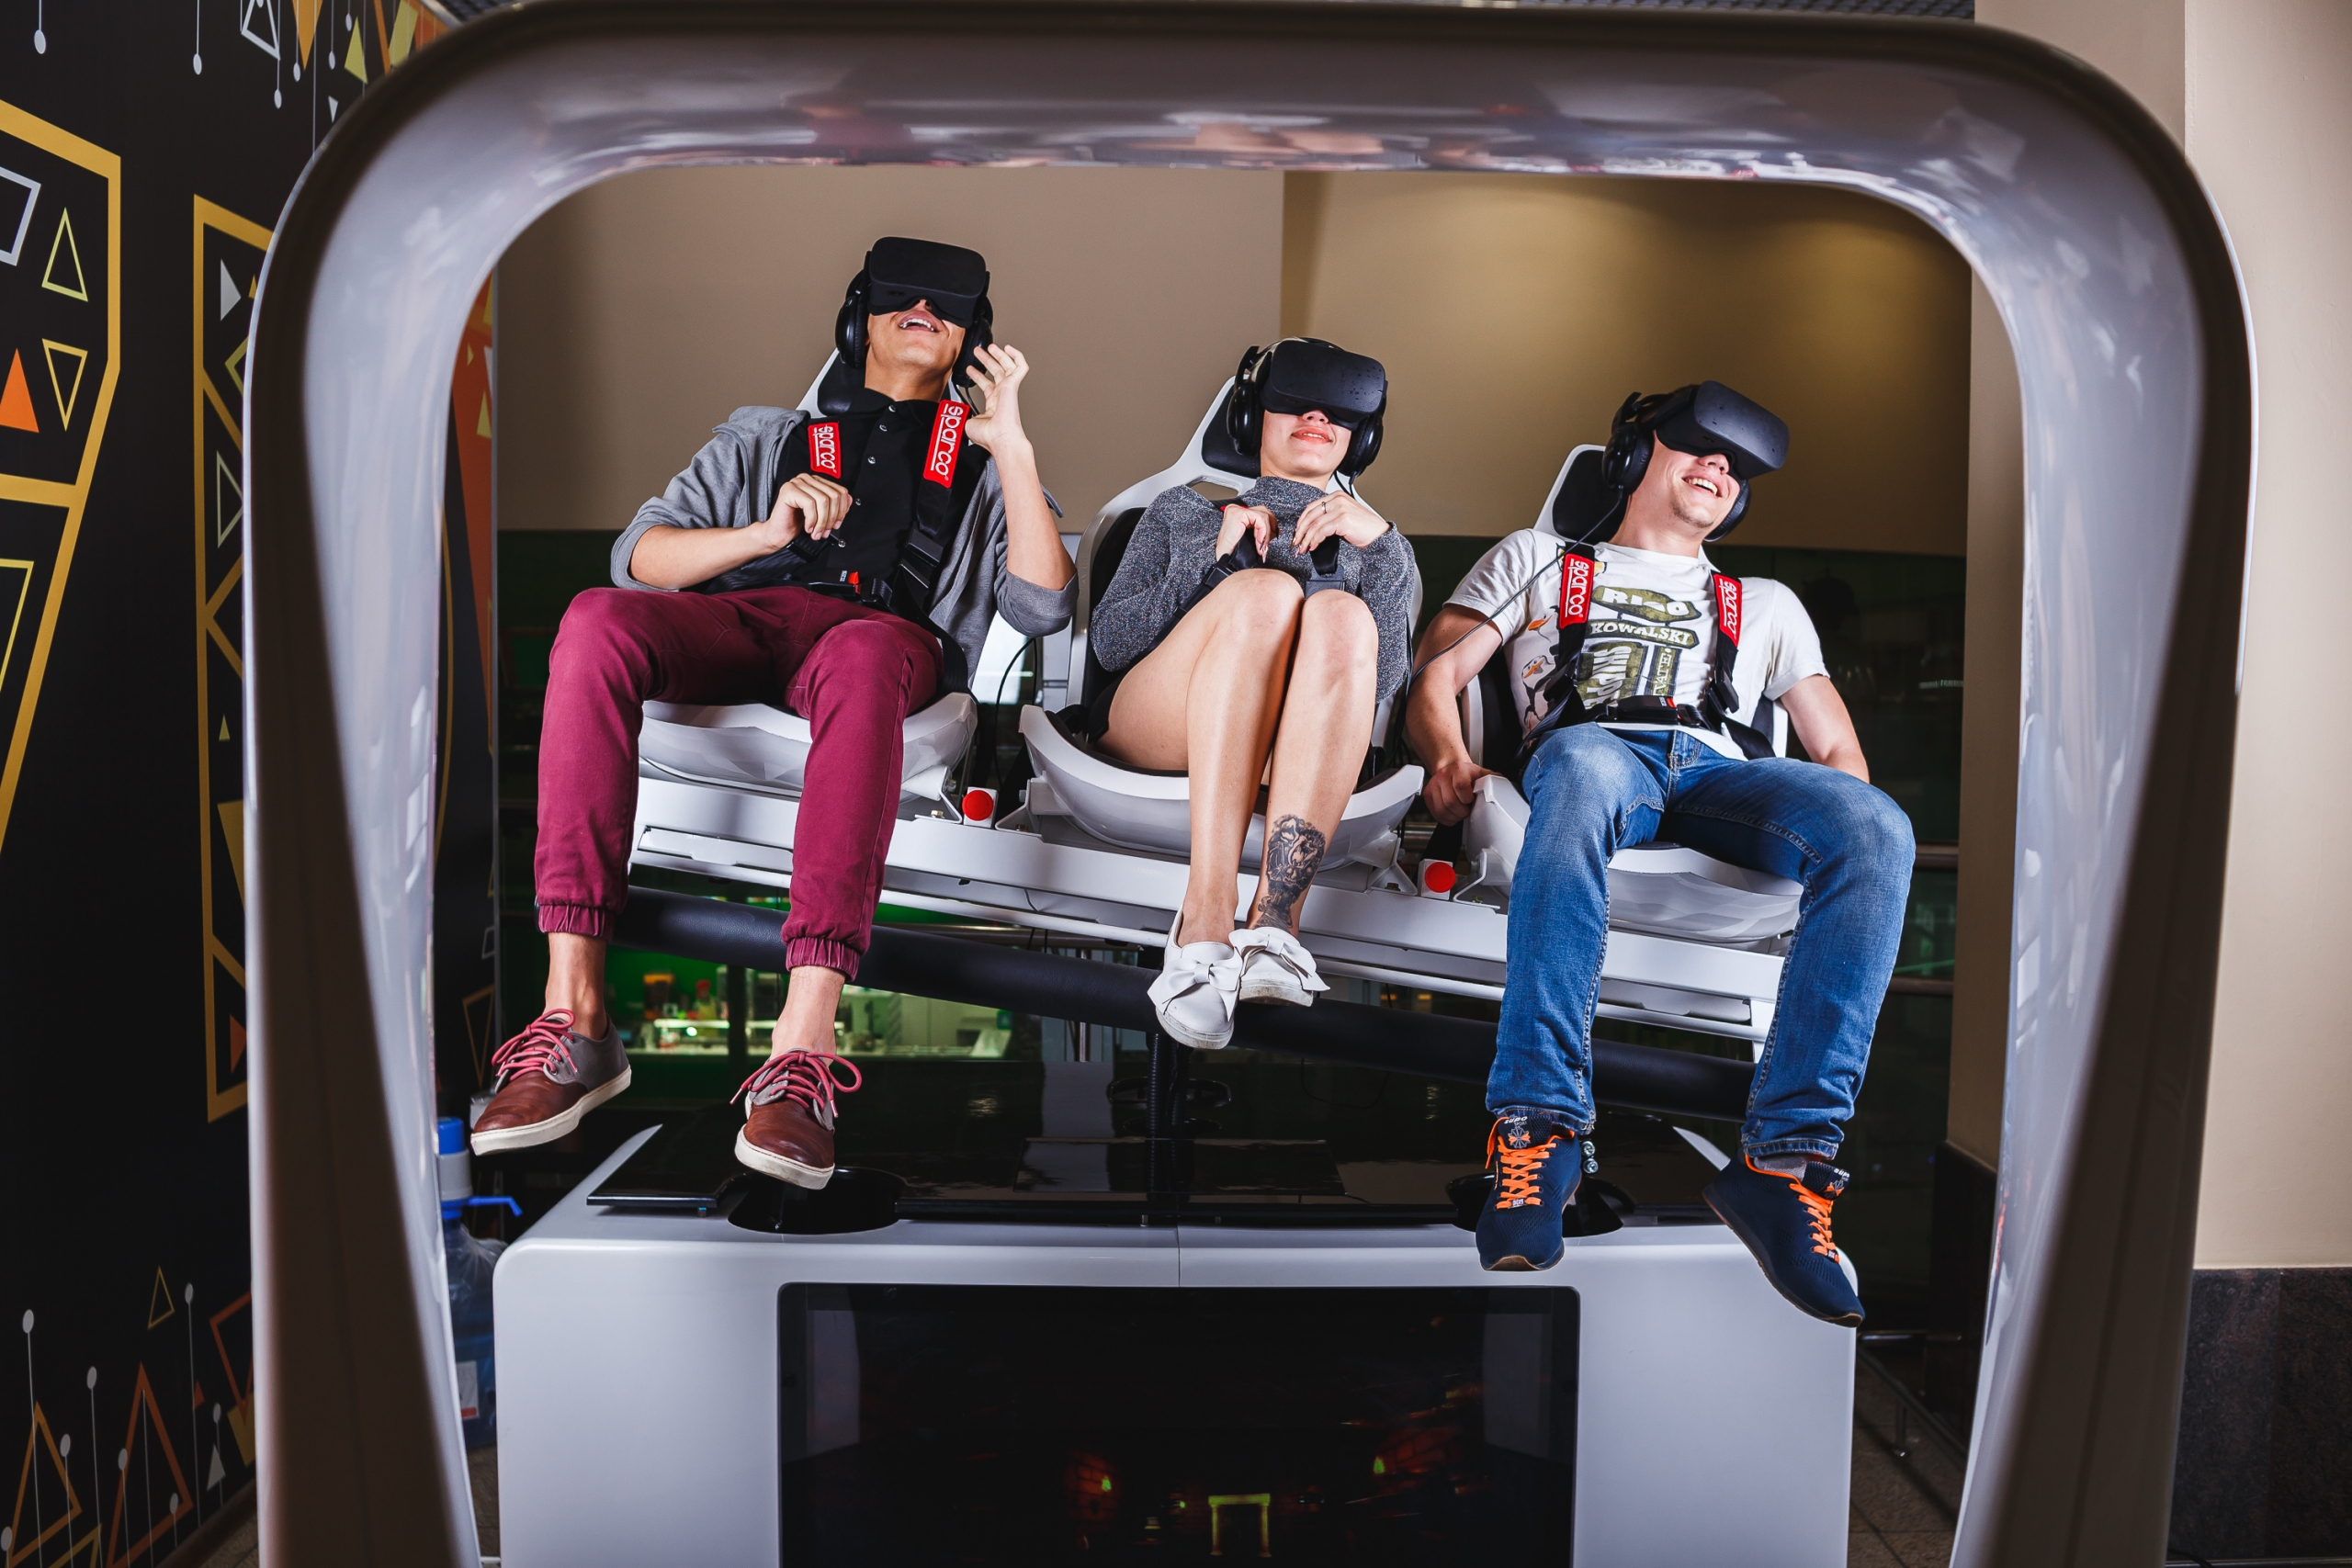 Аттракцион виртуальной реальности «XRIDE» в Ивано-Франковске